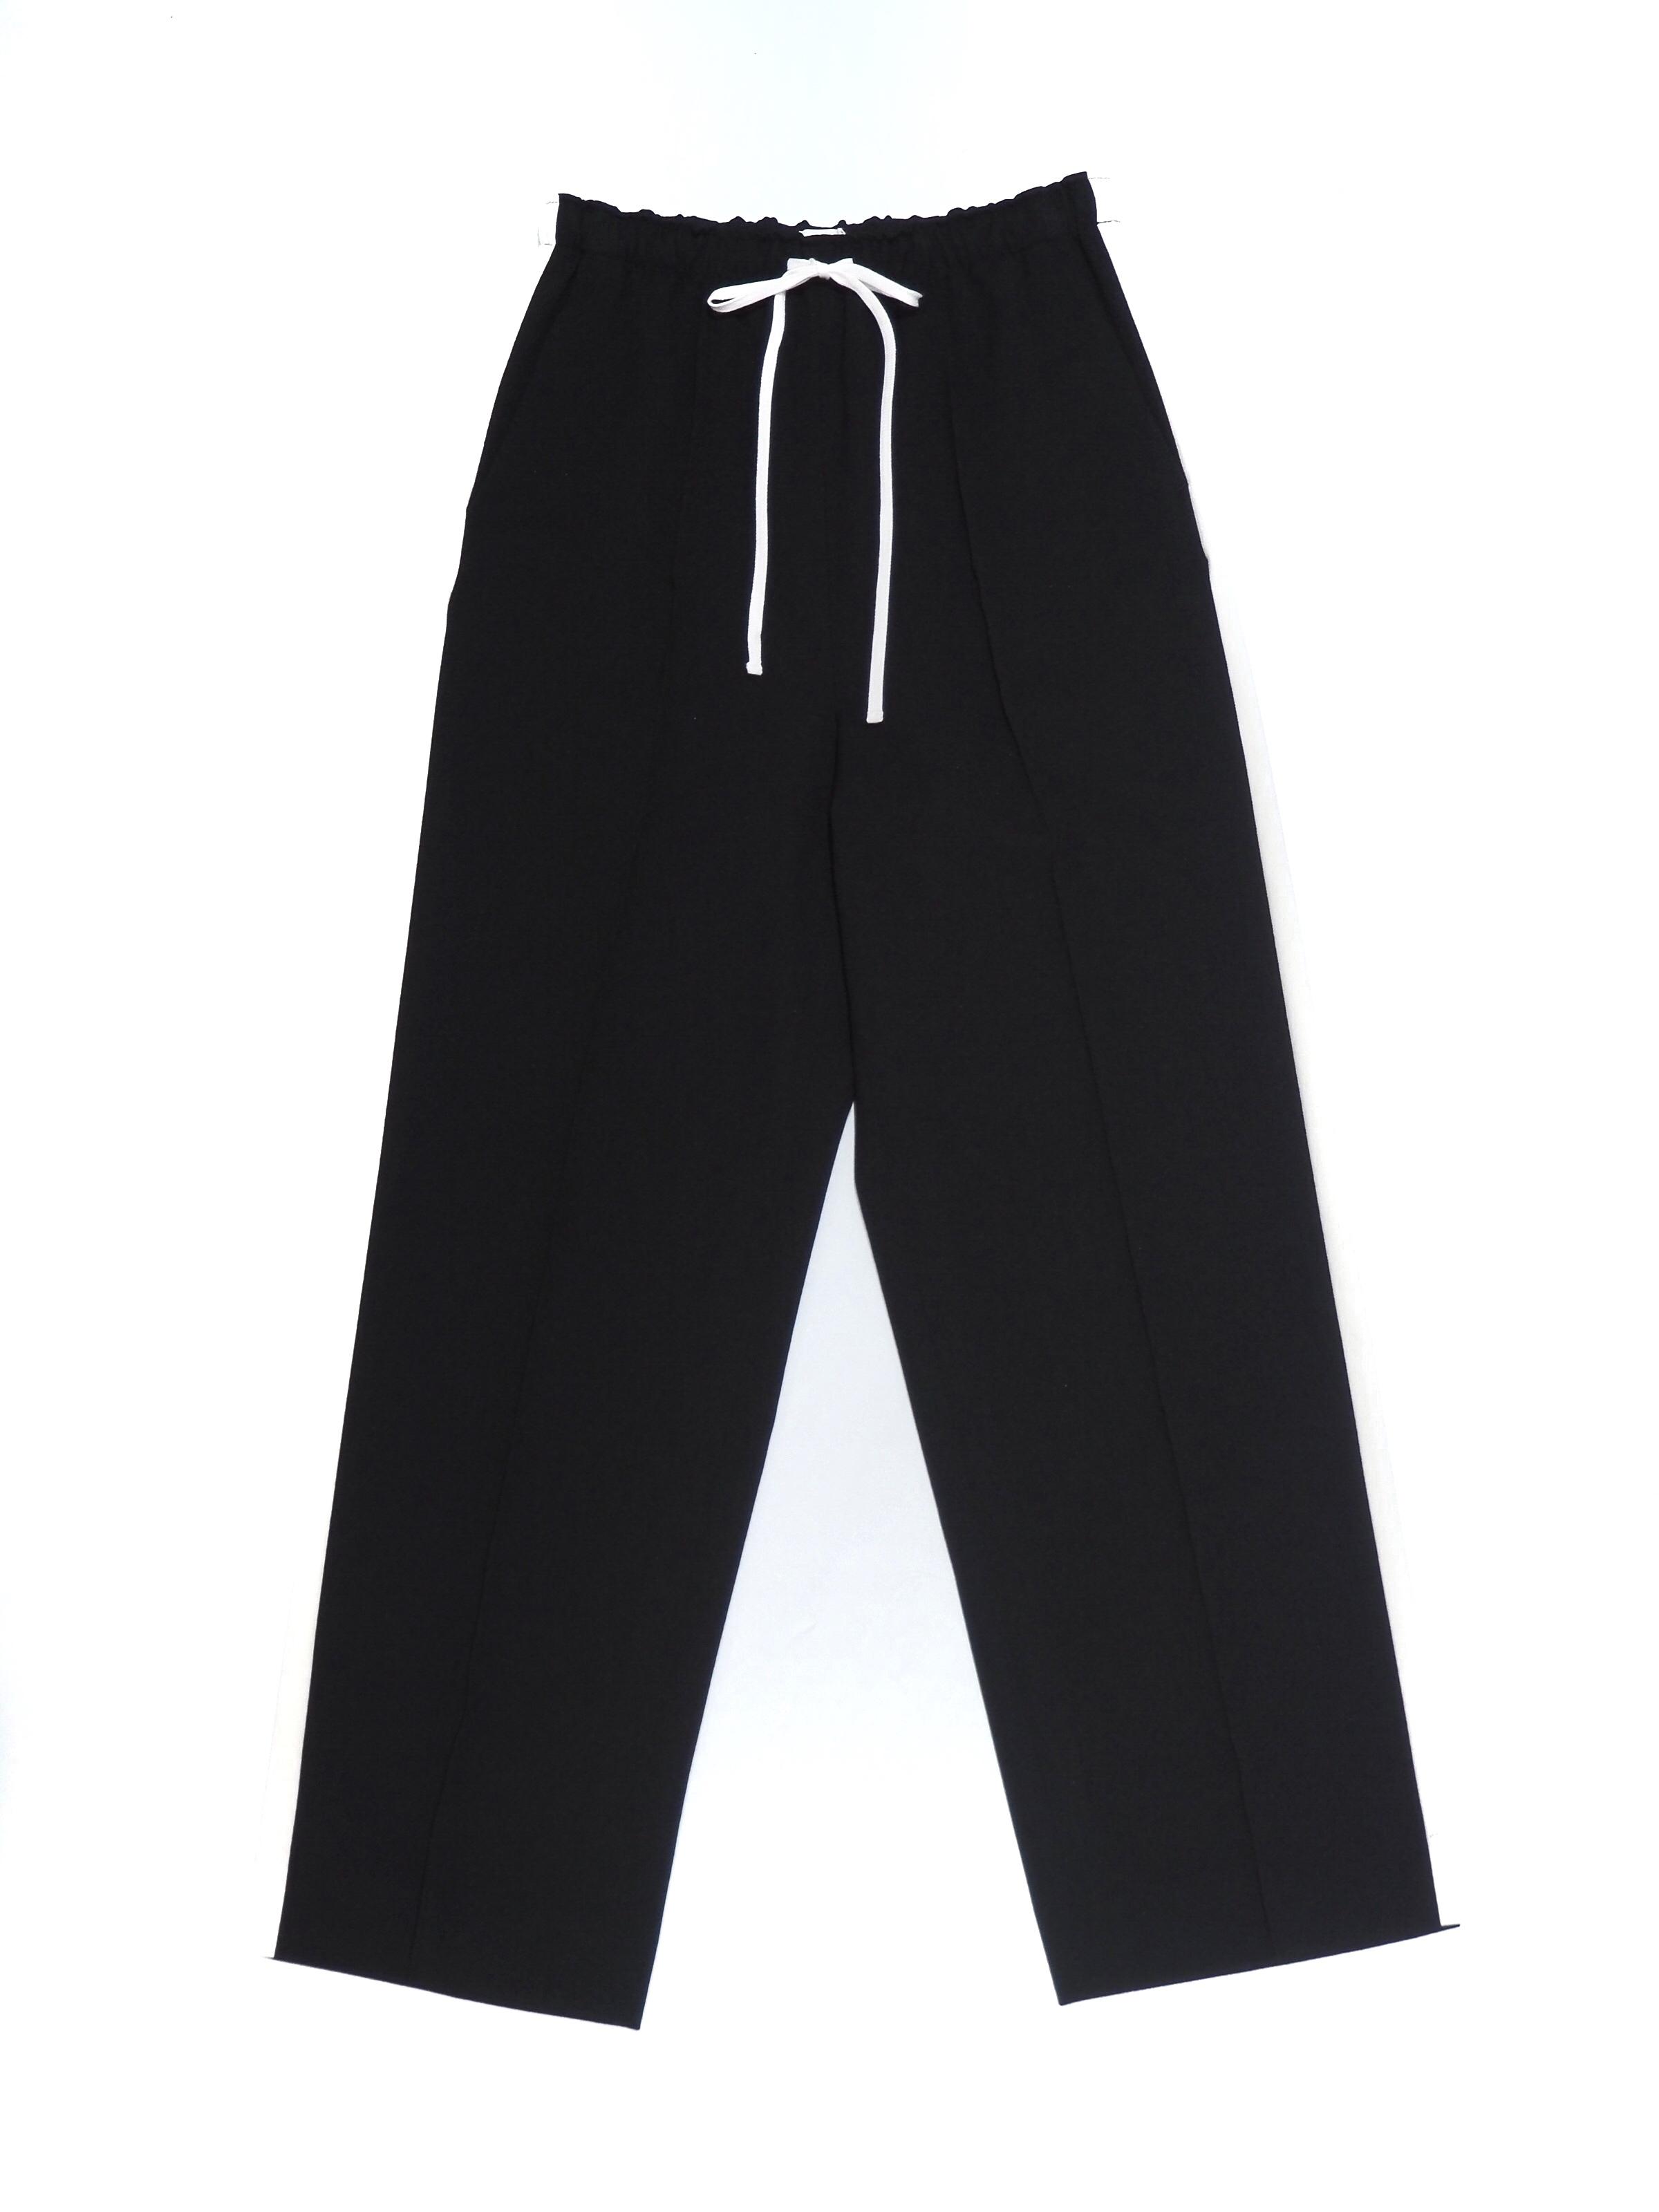 【ELIN】SIDE LINE PANTS